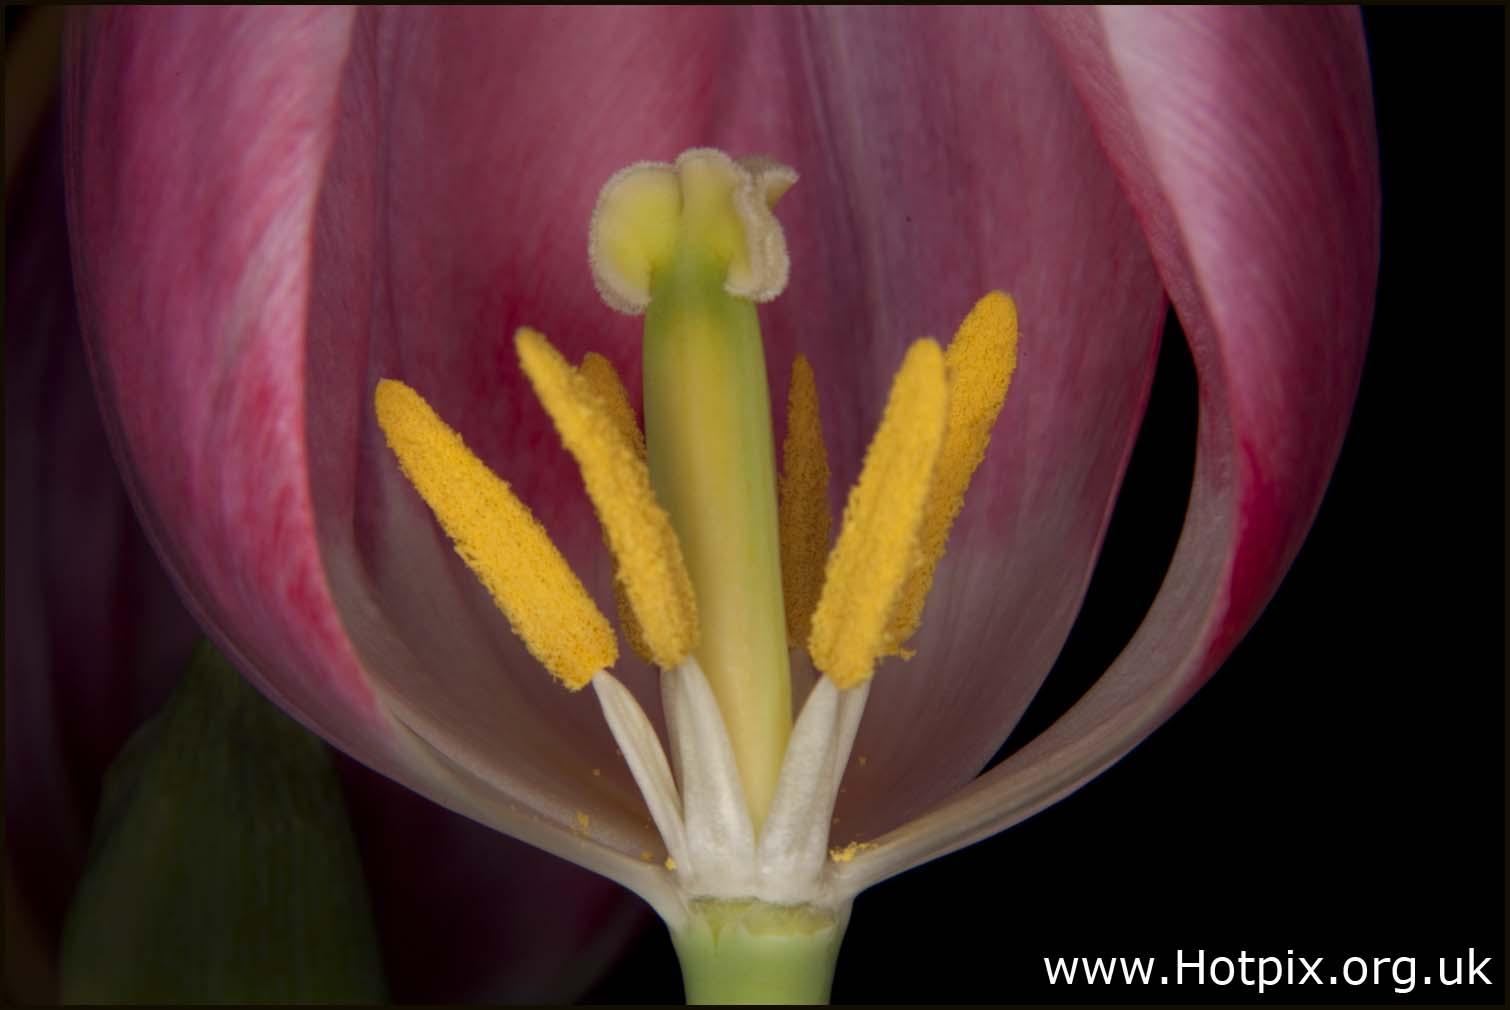 tulip,pink,macro,tubes,bellows,closeup,tripod,stamen,overy,overies,grappenhall,florest,2lips,welsh,cheshire,uk,england,petals,flowers,winter,spring,tonysmith,hotpix,tony,smith,plant,bloom,hotpics,hotpic,hotpick,hotpicks,nature,natural,world,flower,flores,blome,hot,pics,pix,picks,hotpix.freeserve.co.uk,art,arty,sex,sexy